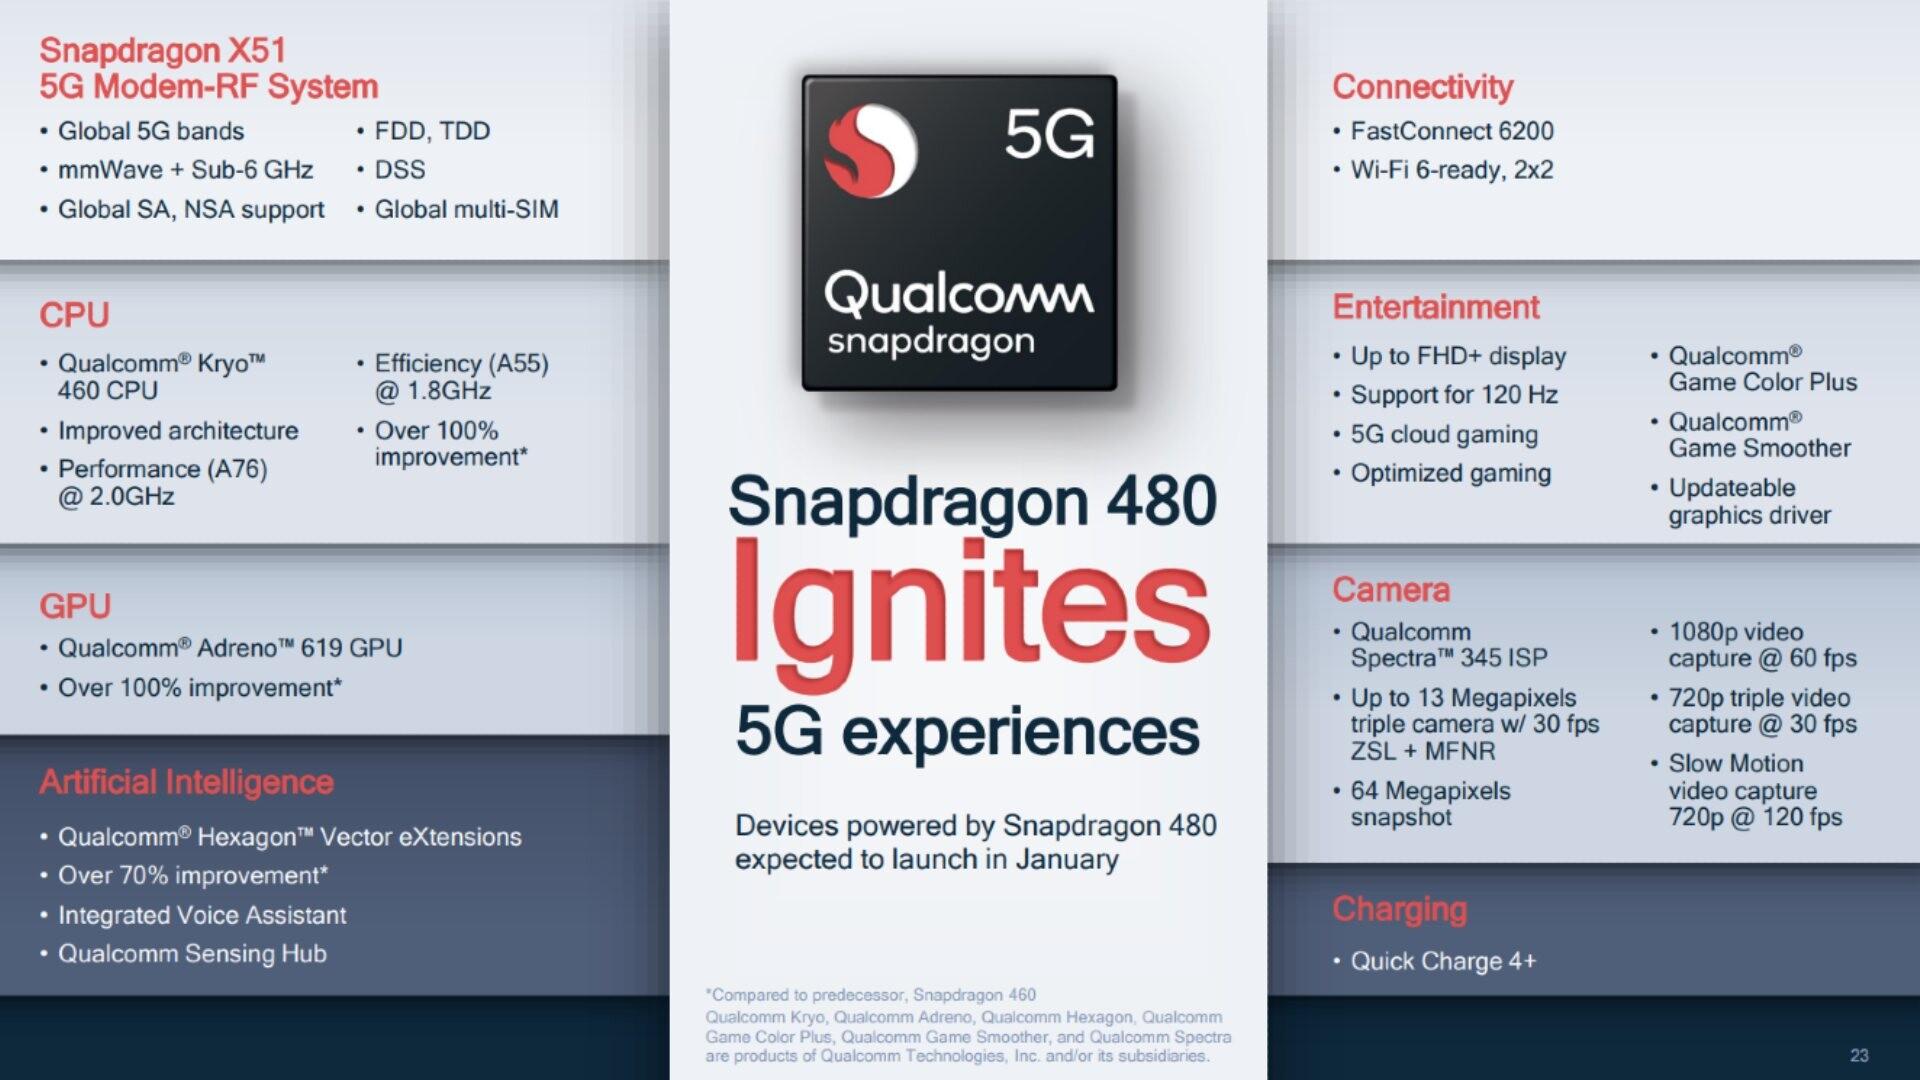 Qualcomm Snapdragon 480